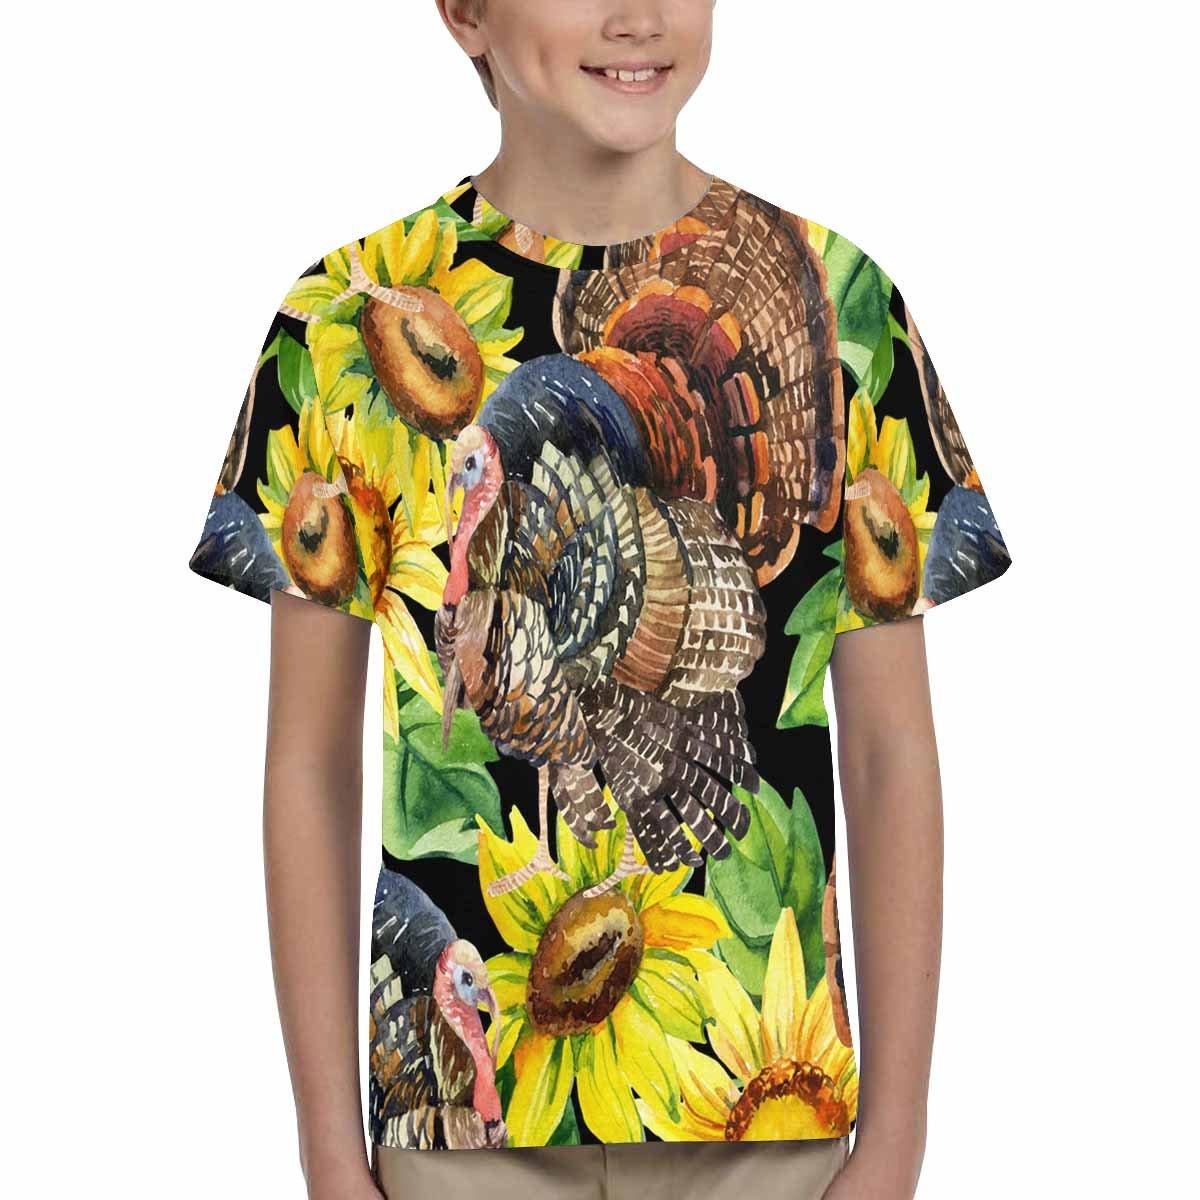 INTERESTPRINT Childs T-Shirt Turkey Bird with Sunflowers XS-XL